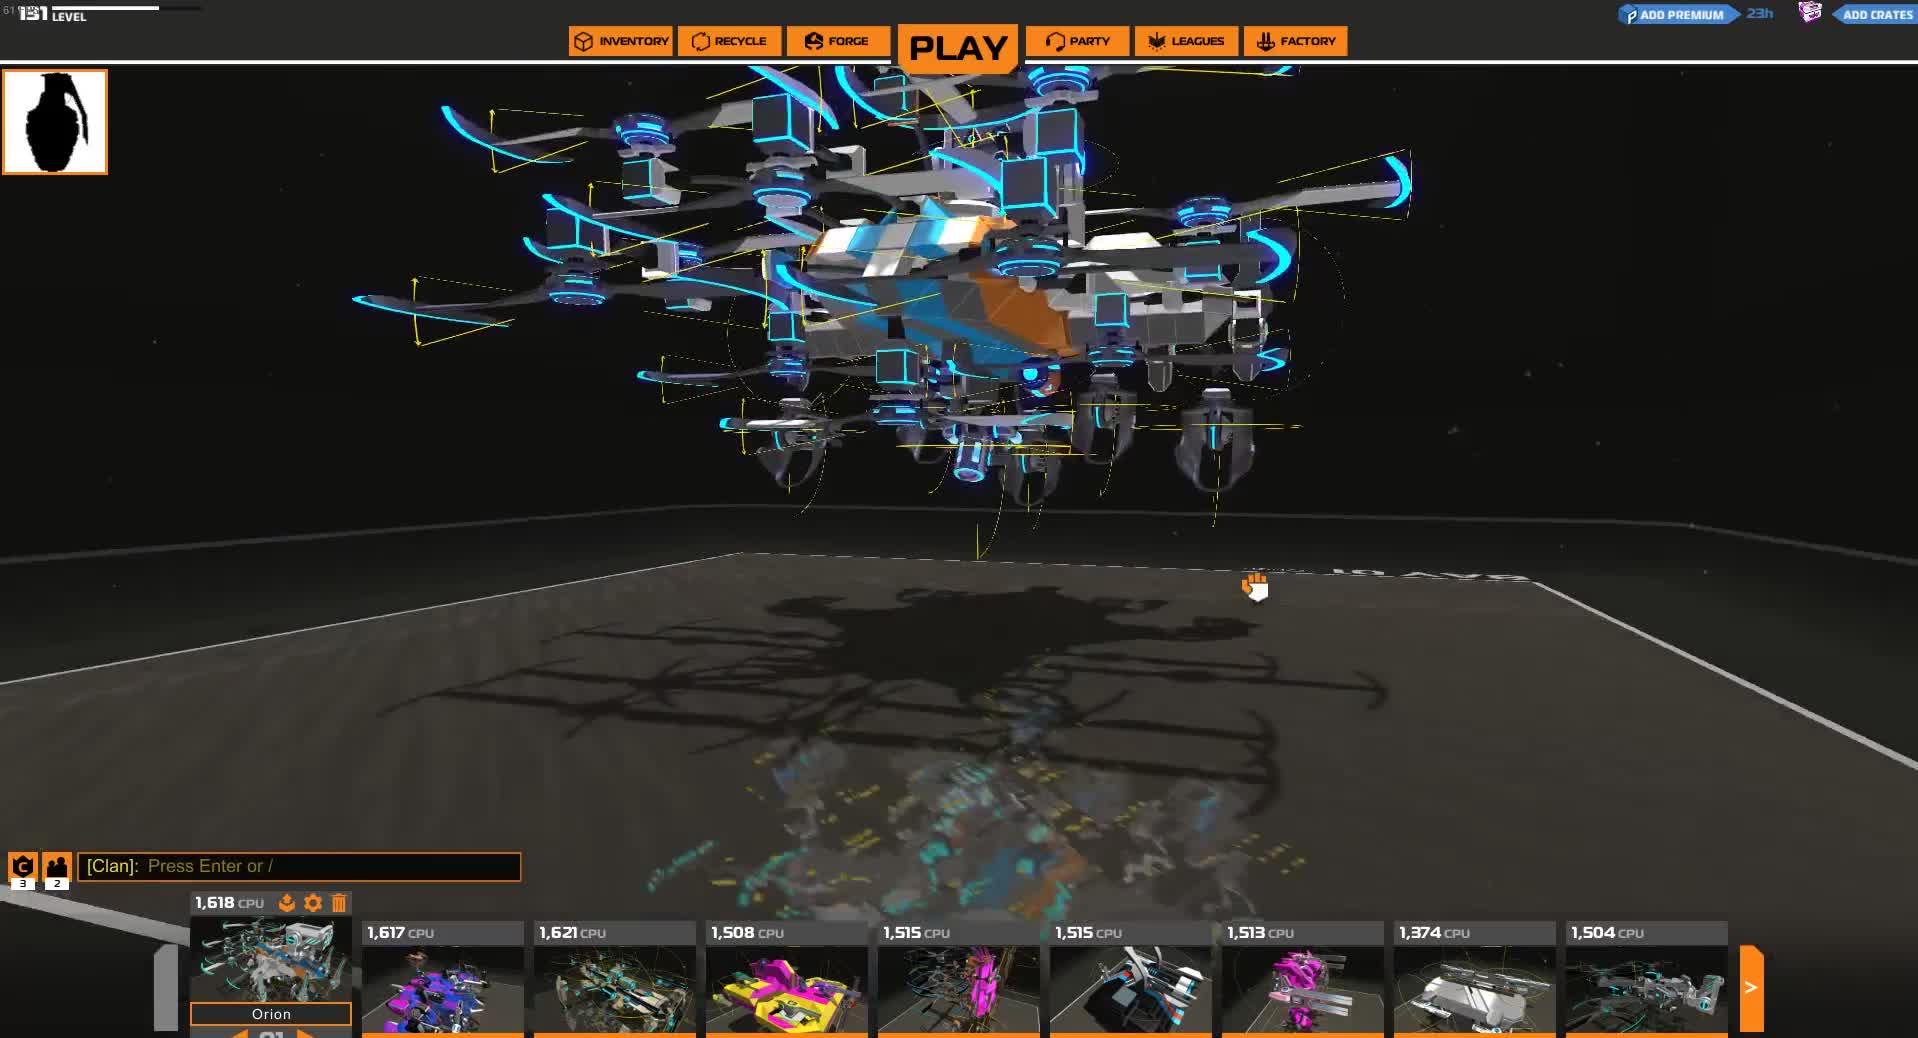 robocraft, Orion GIFs